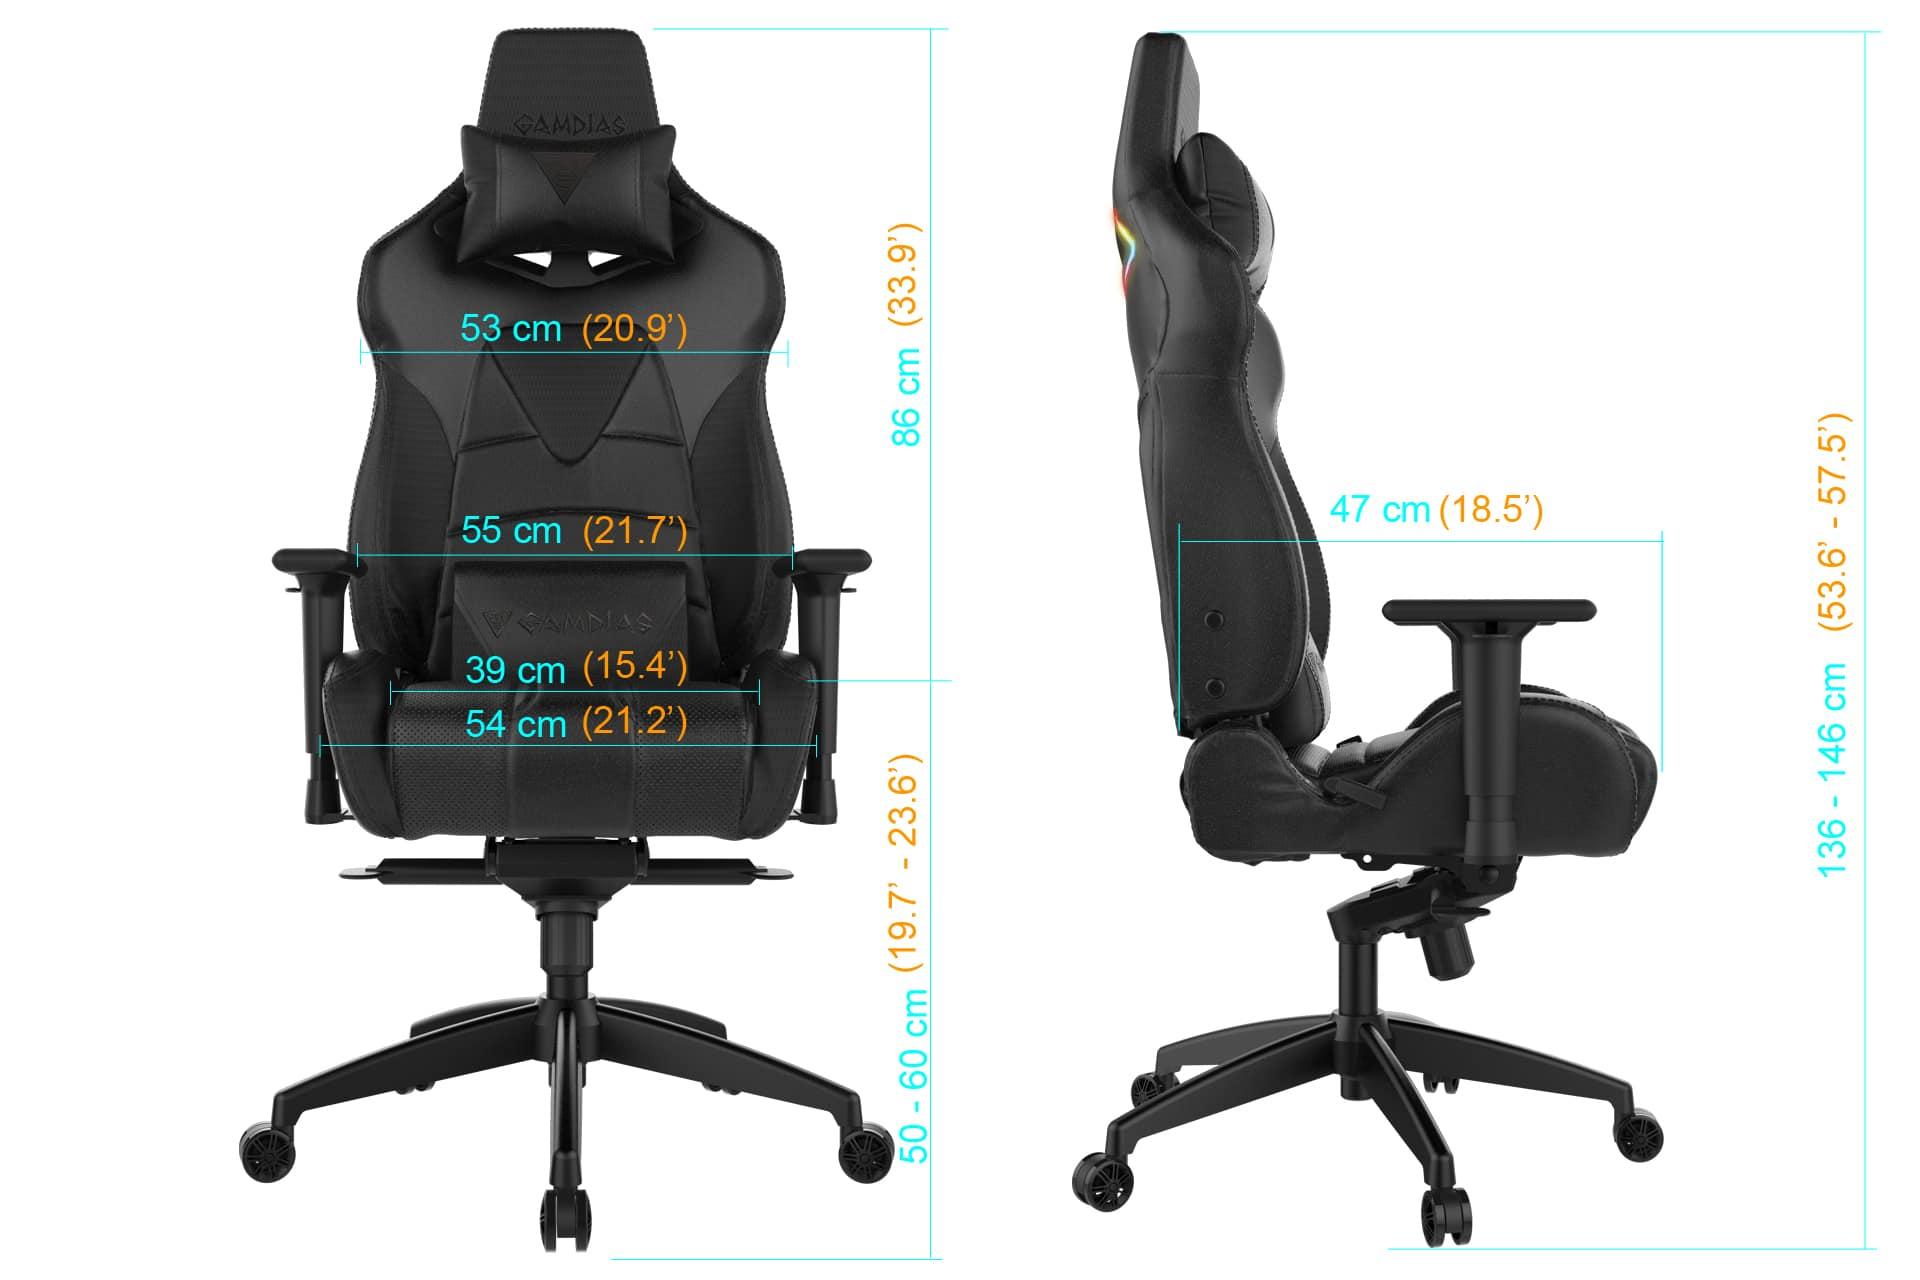 gamdias achilles m1 l gaming stuhl mit rgb beleuchtung im test. Black Bedroom Furniture Sets. Home Design Ideas